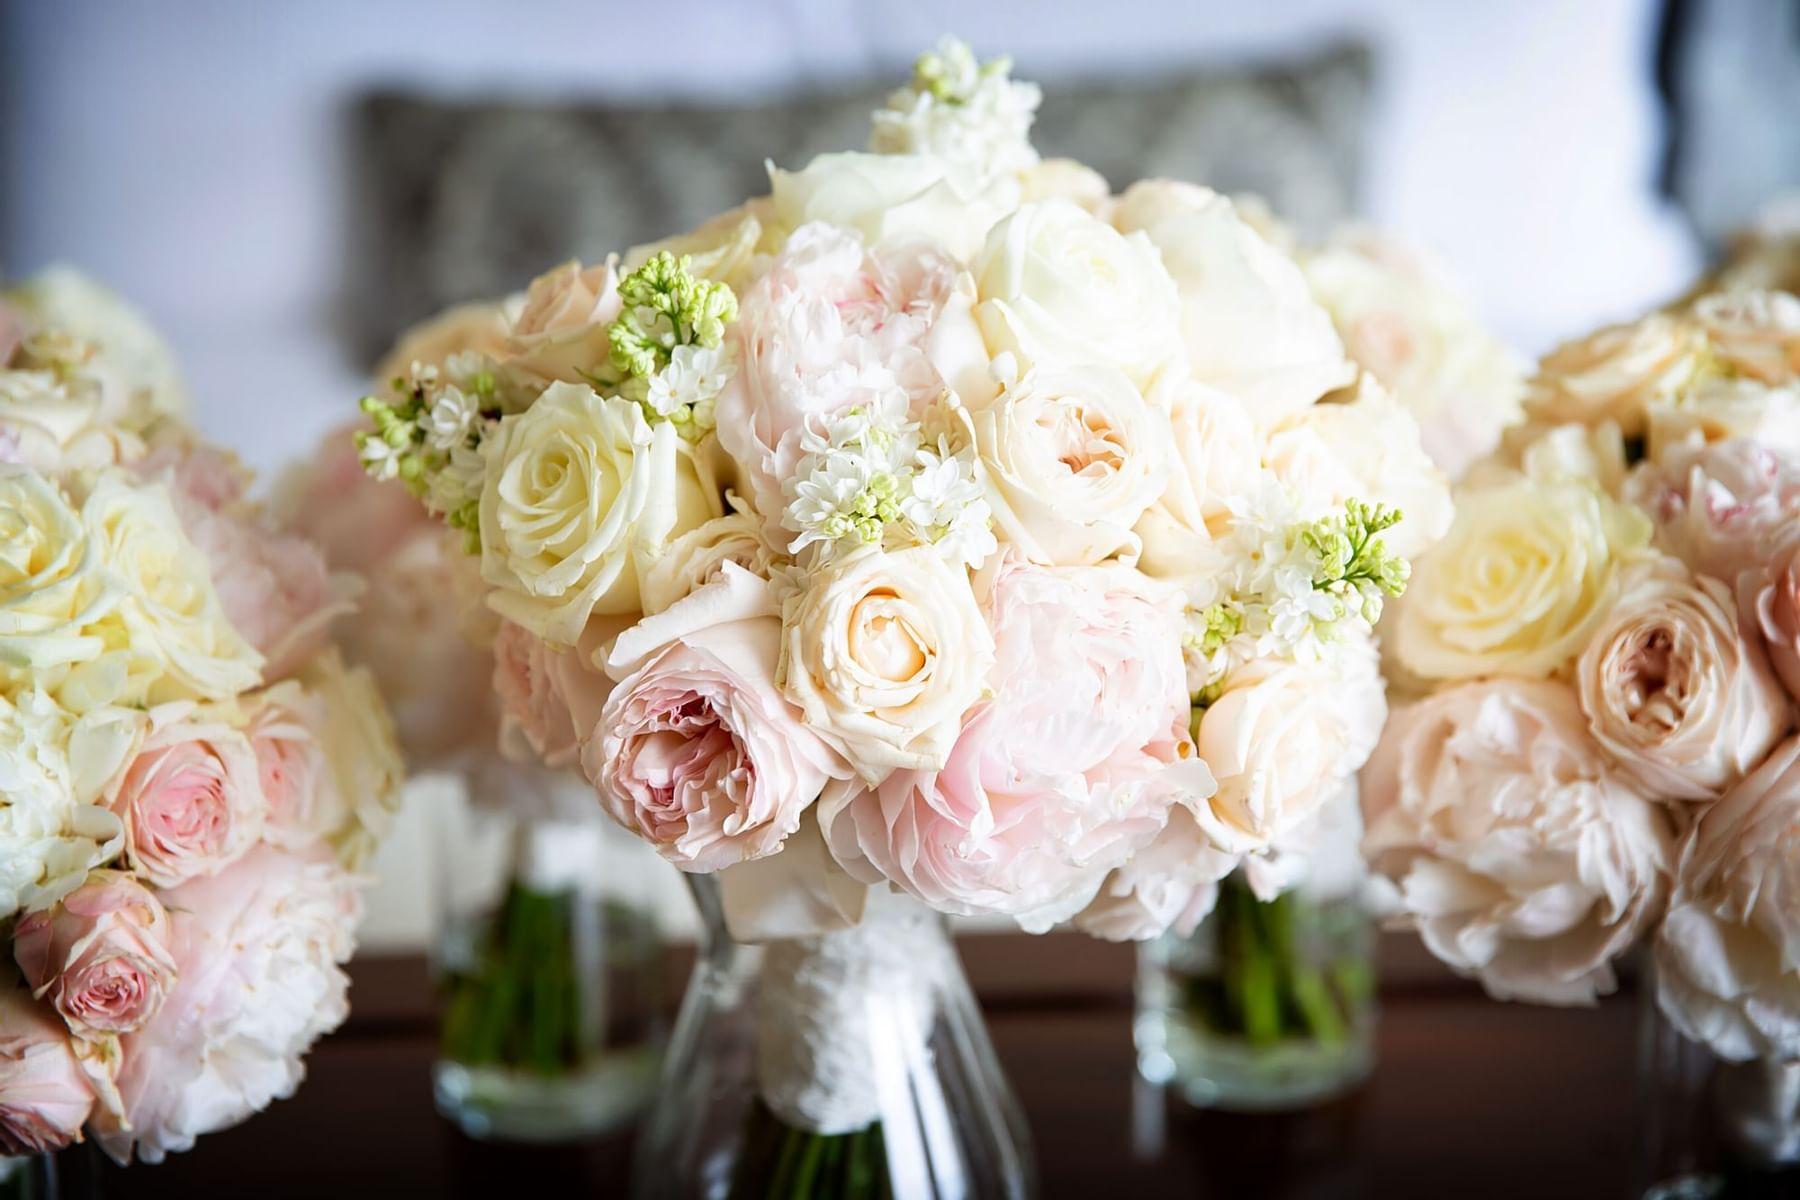 Wedding bouquets as centerpieces